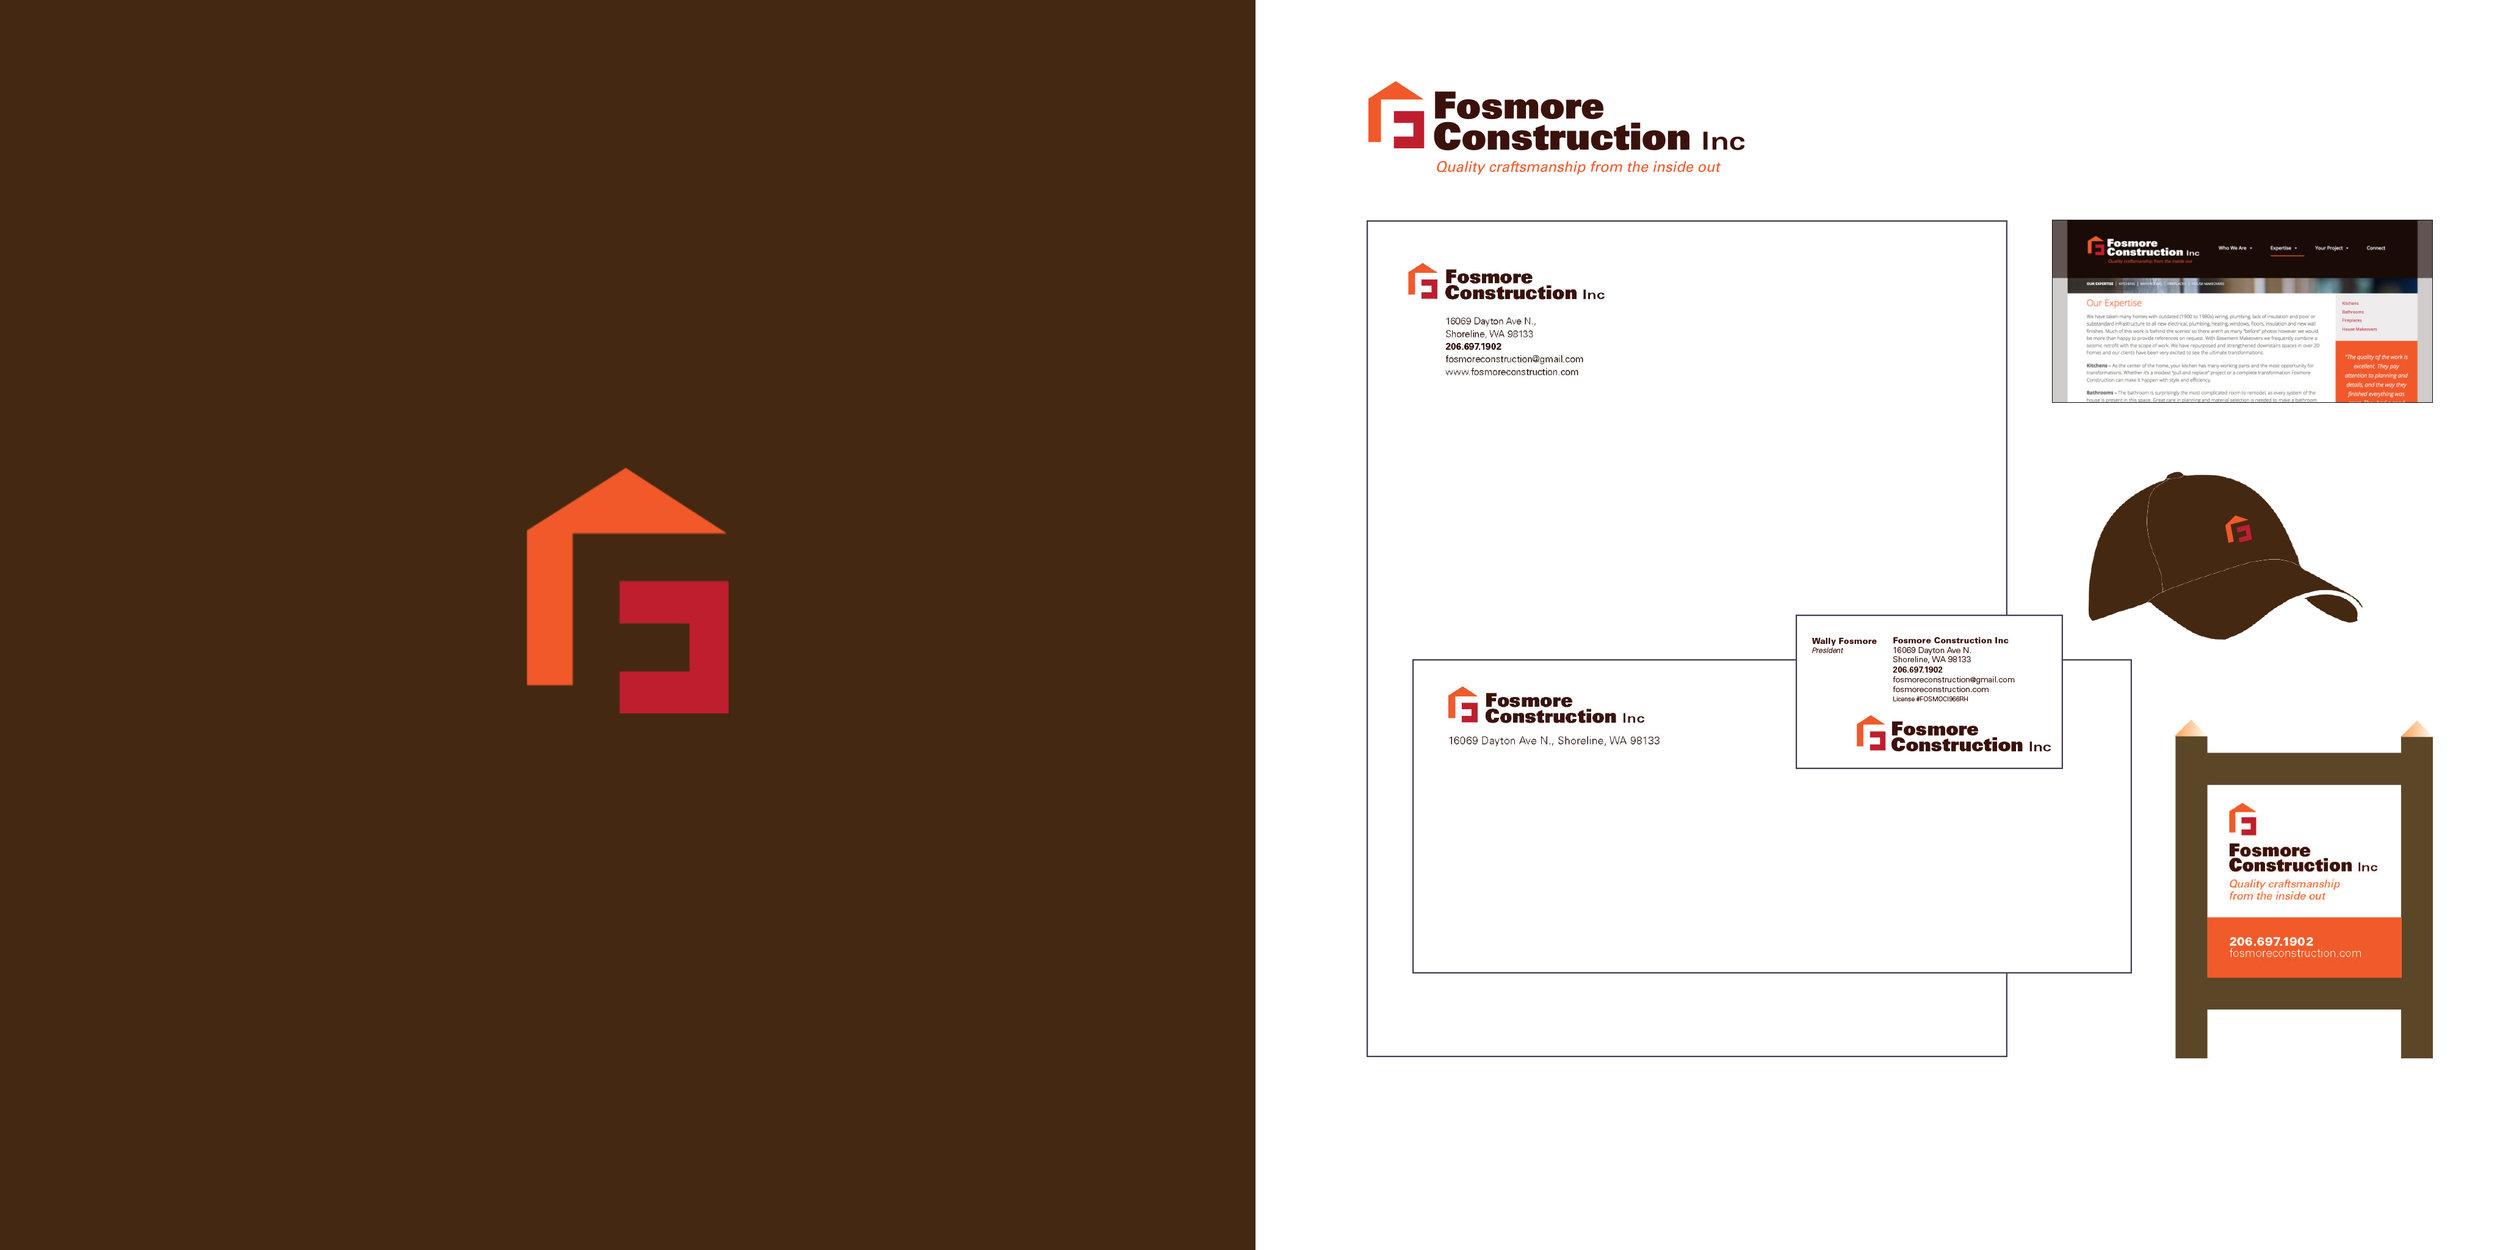 FC-logo-spread.jpg